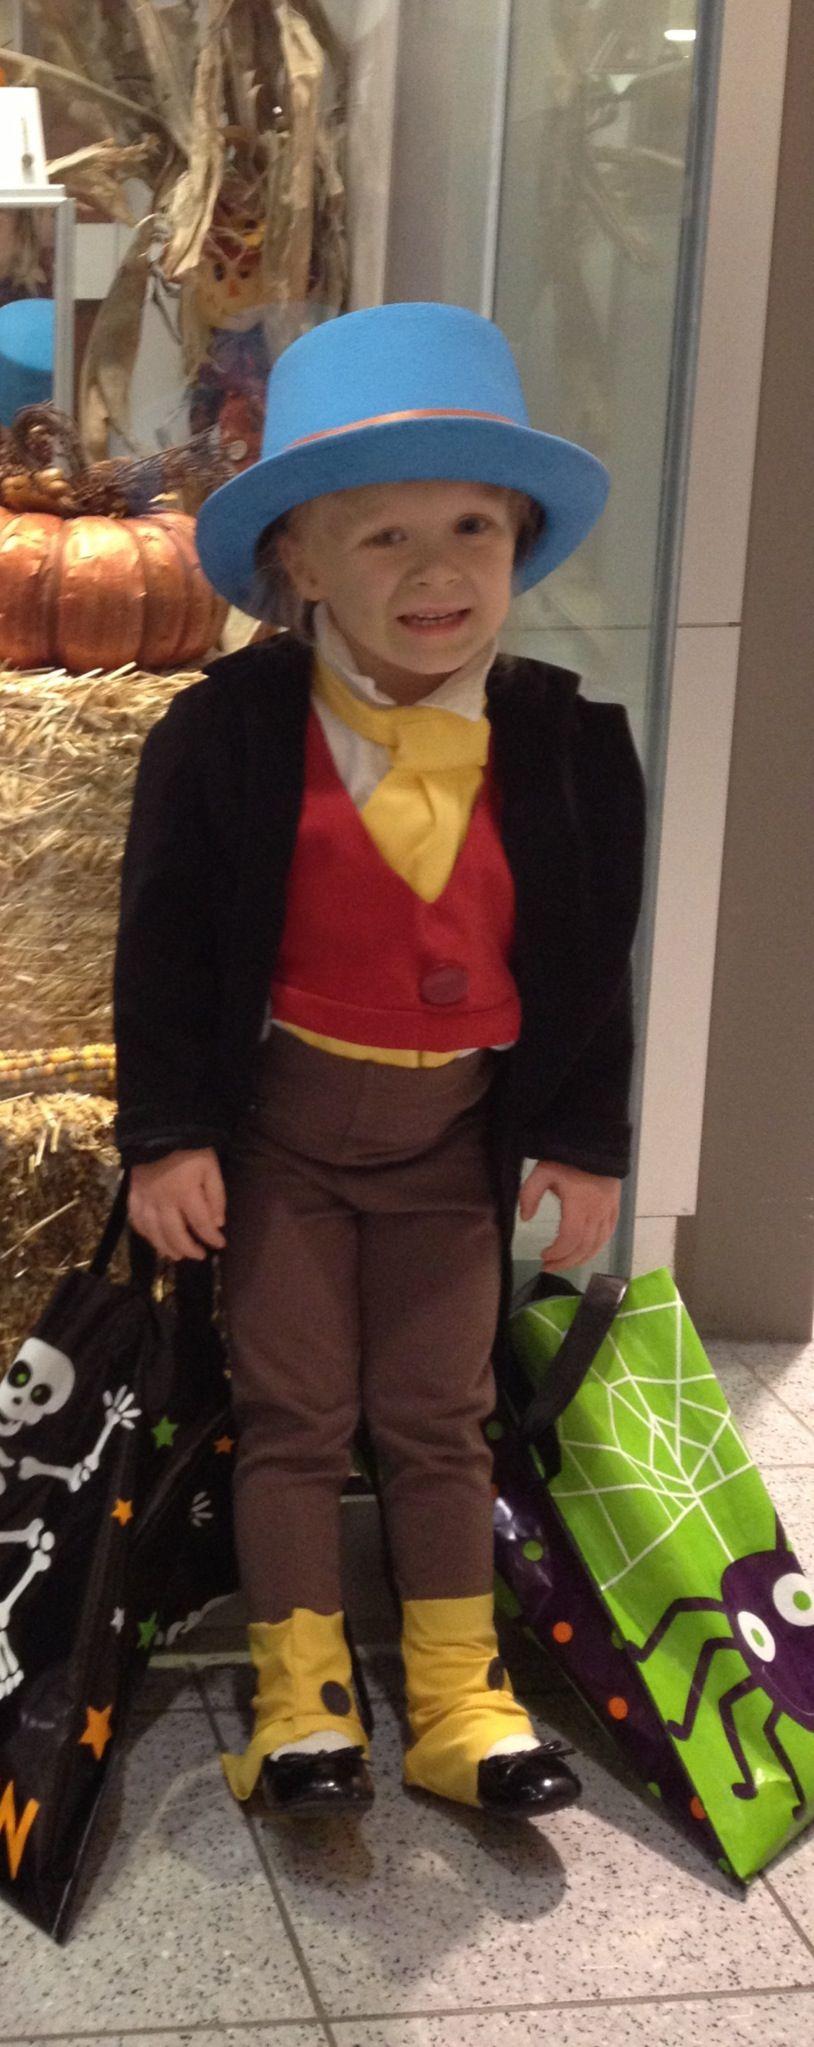 Disney Jiminy Cricket Costume Pinocchio wwwmydisneylovecom